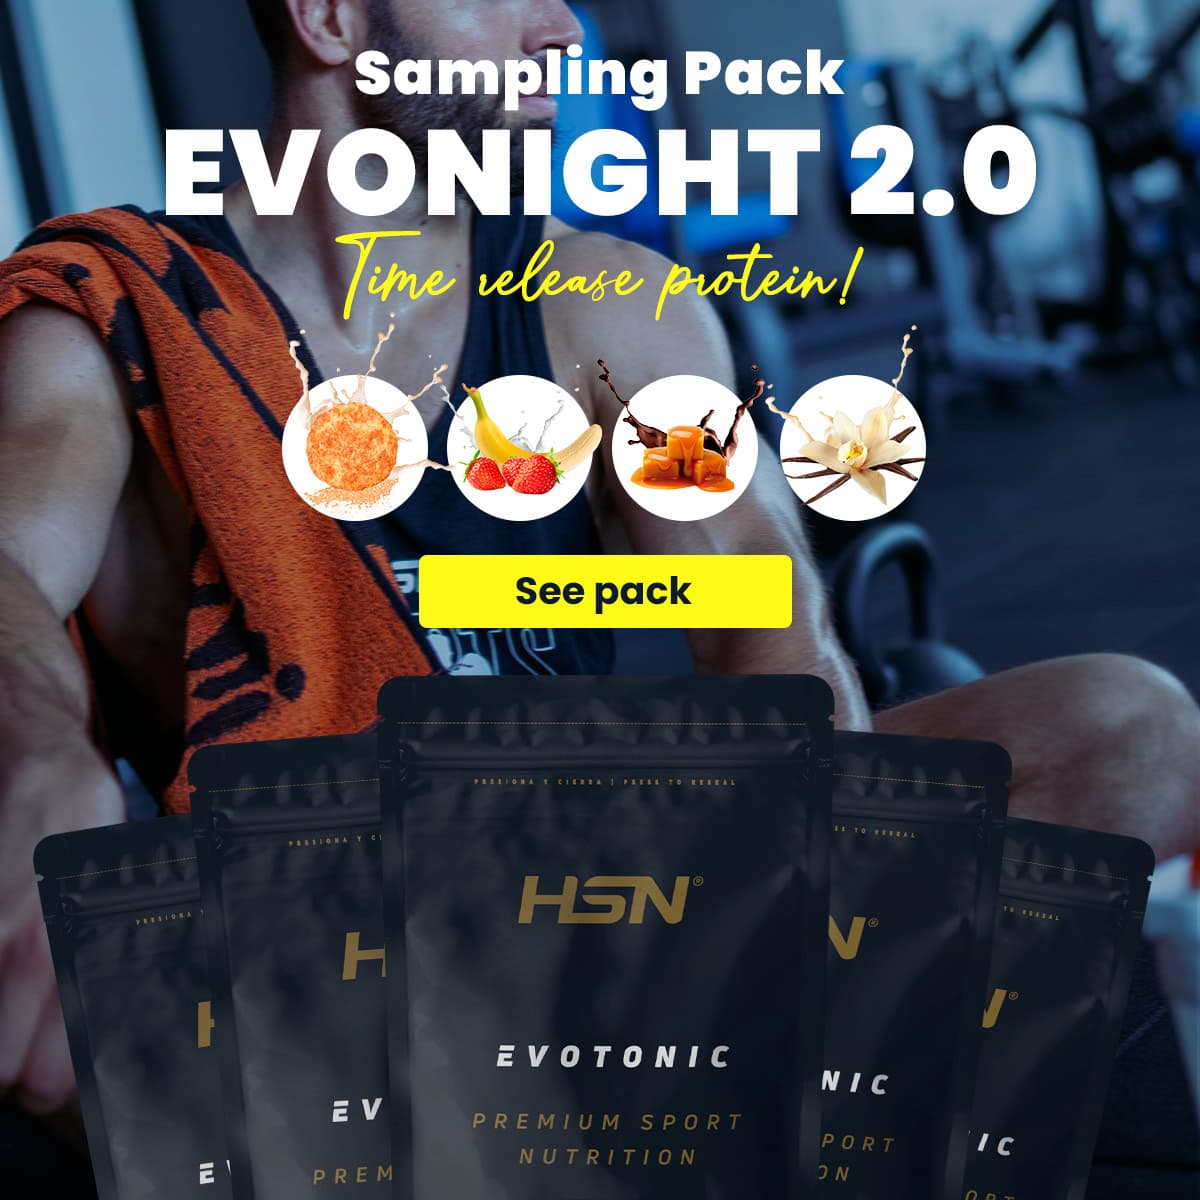 EVONIGHT 2.0- Sampling Pack